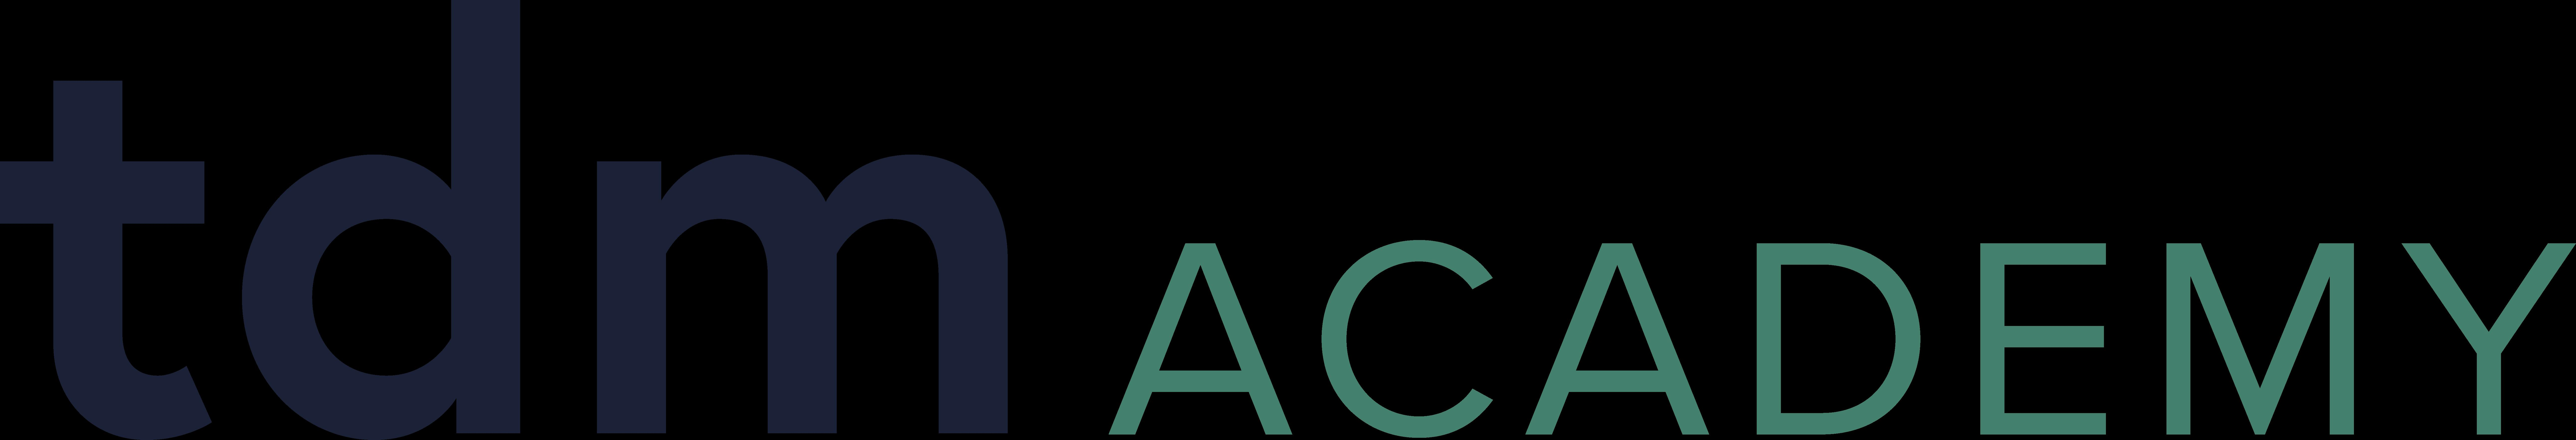 Diversity: Beyond the Checkbox Watermark Logo